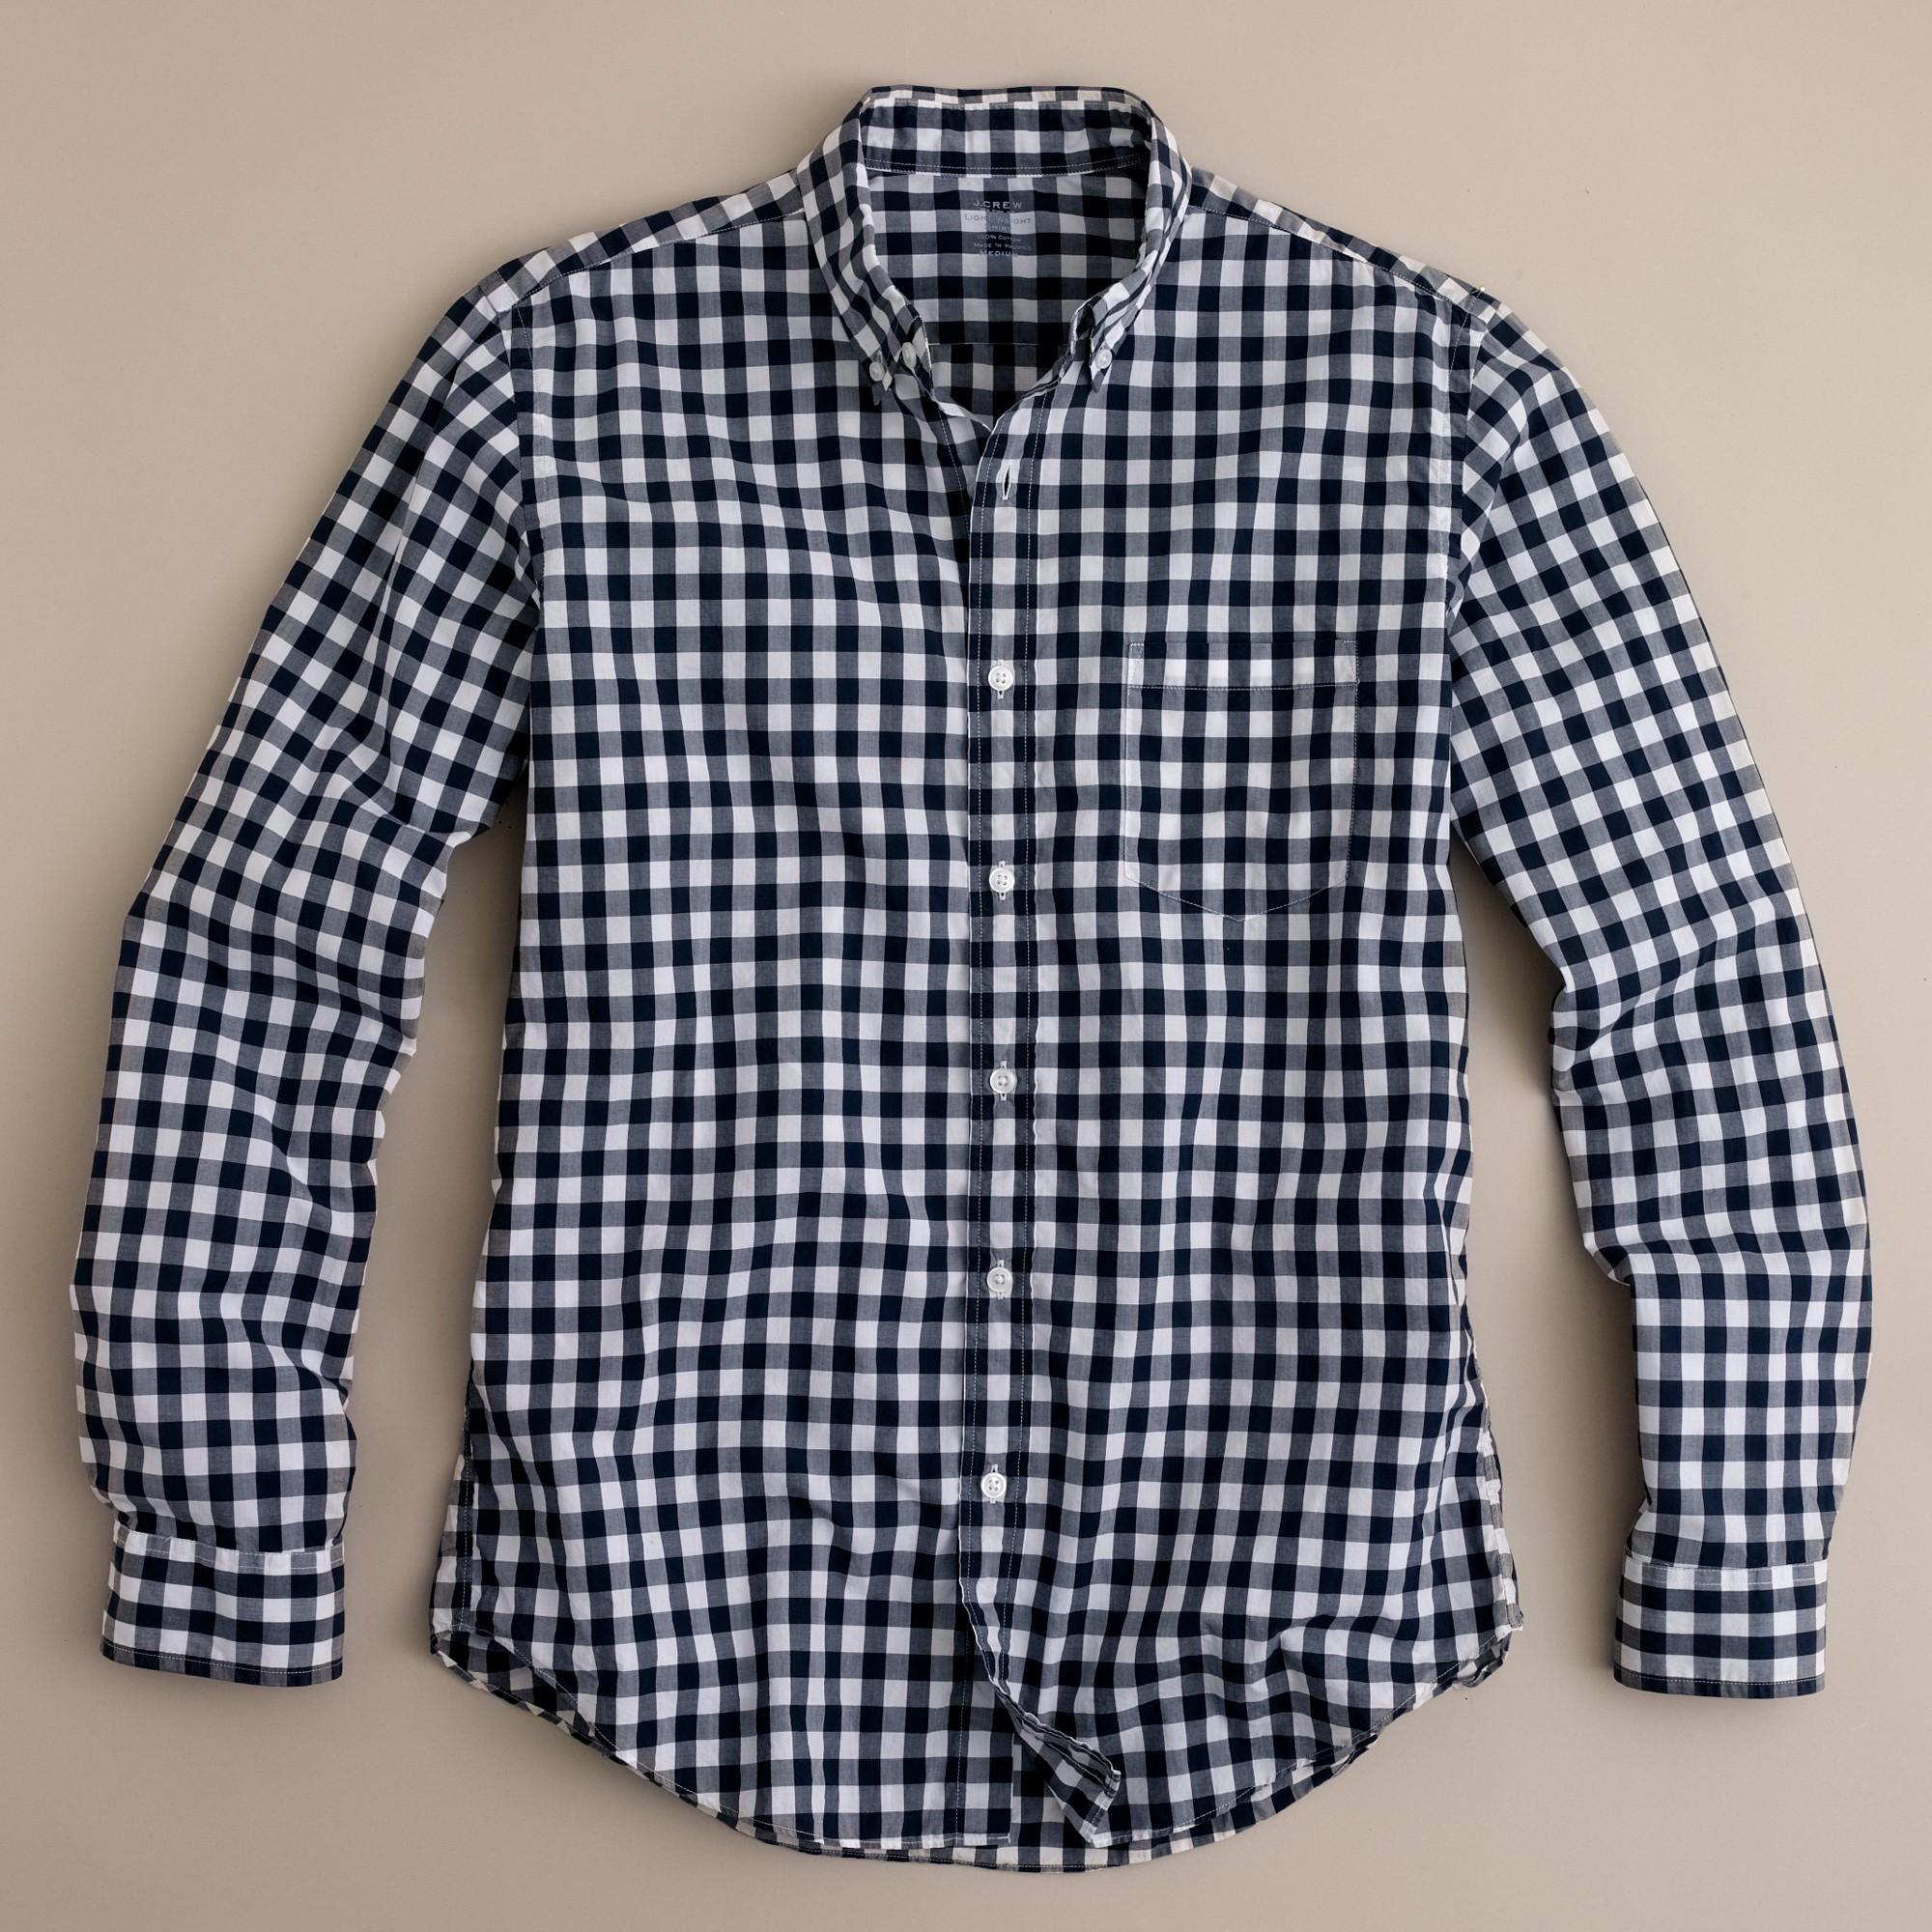 Lyst J Crew Slim Secret Wash Lightweight Shirt In Van